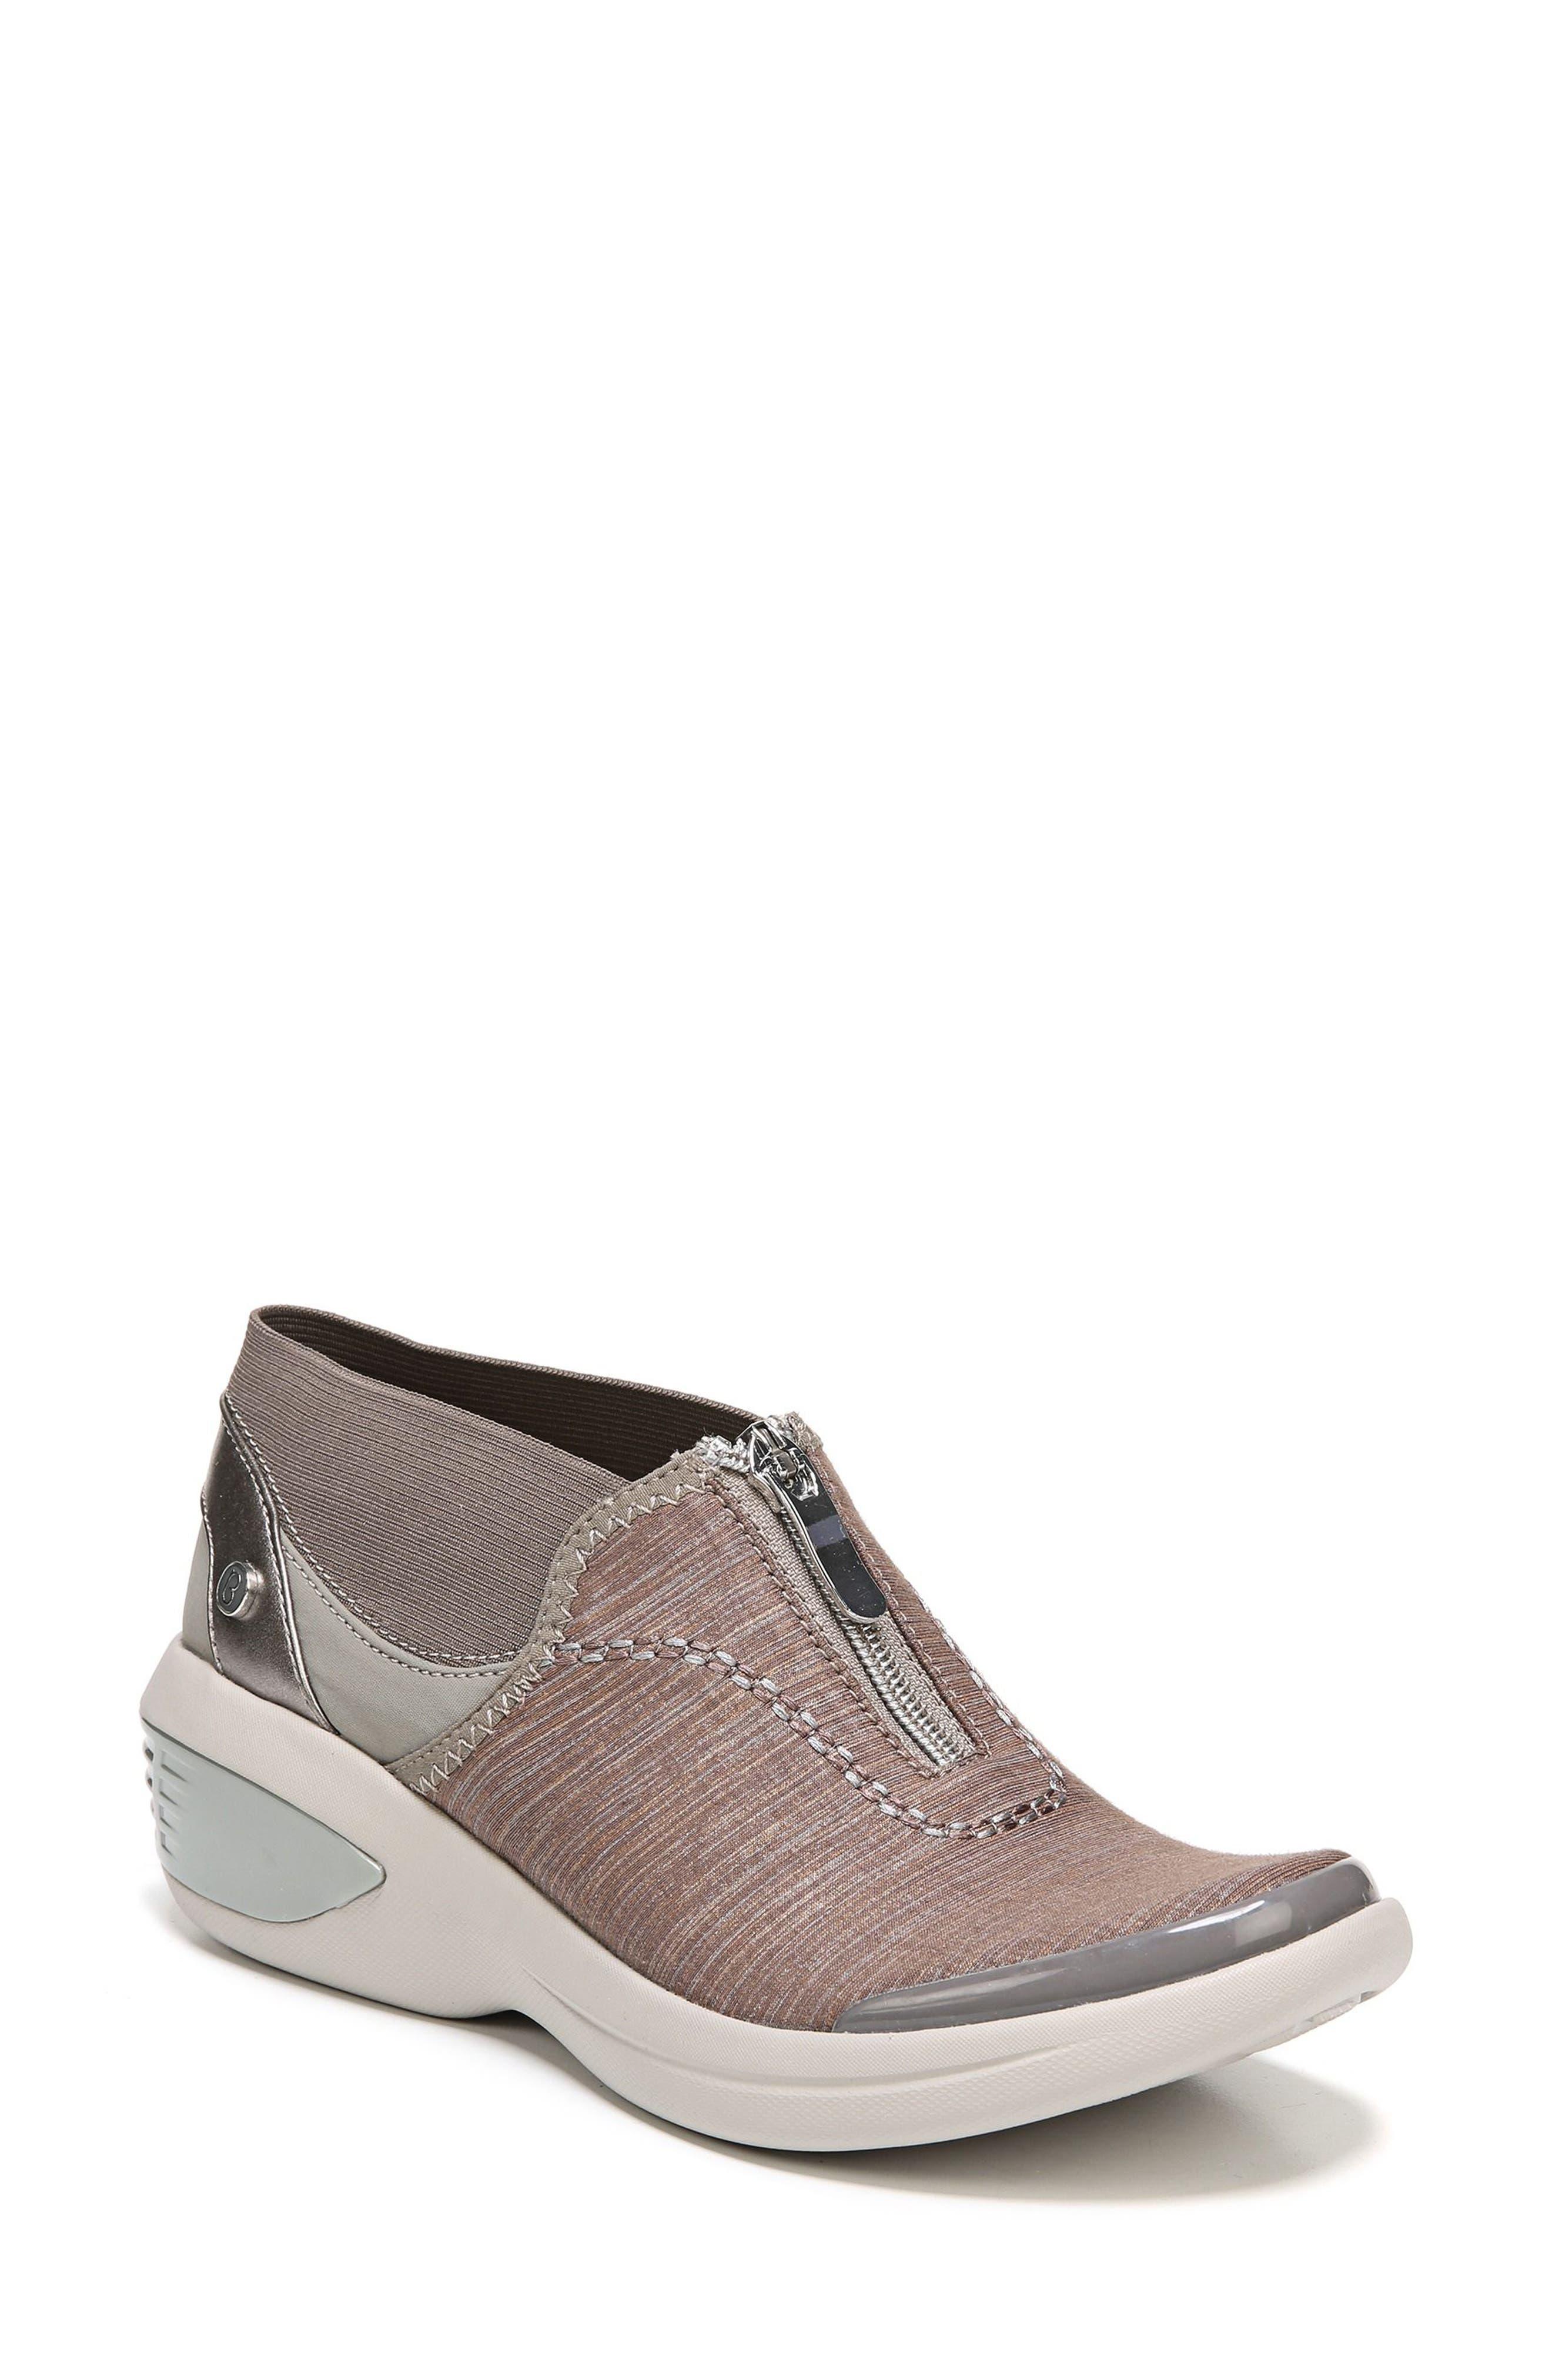 BZEES Fling Wedge Sneaker, Main, color, BROWN FABRIC